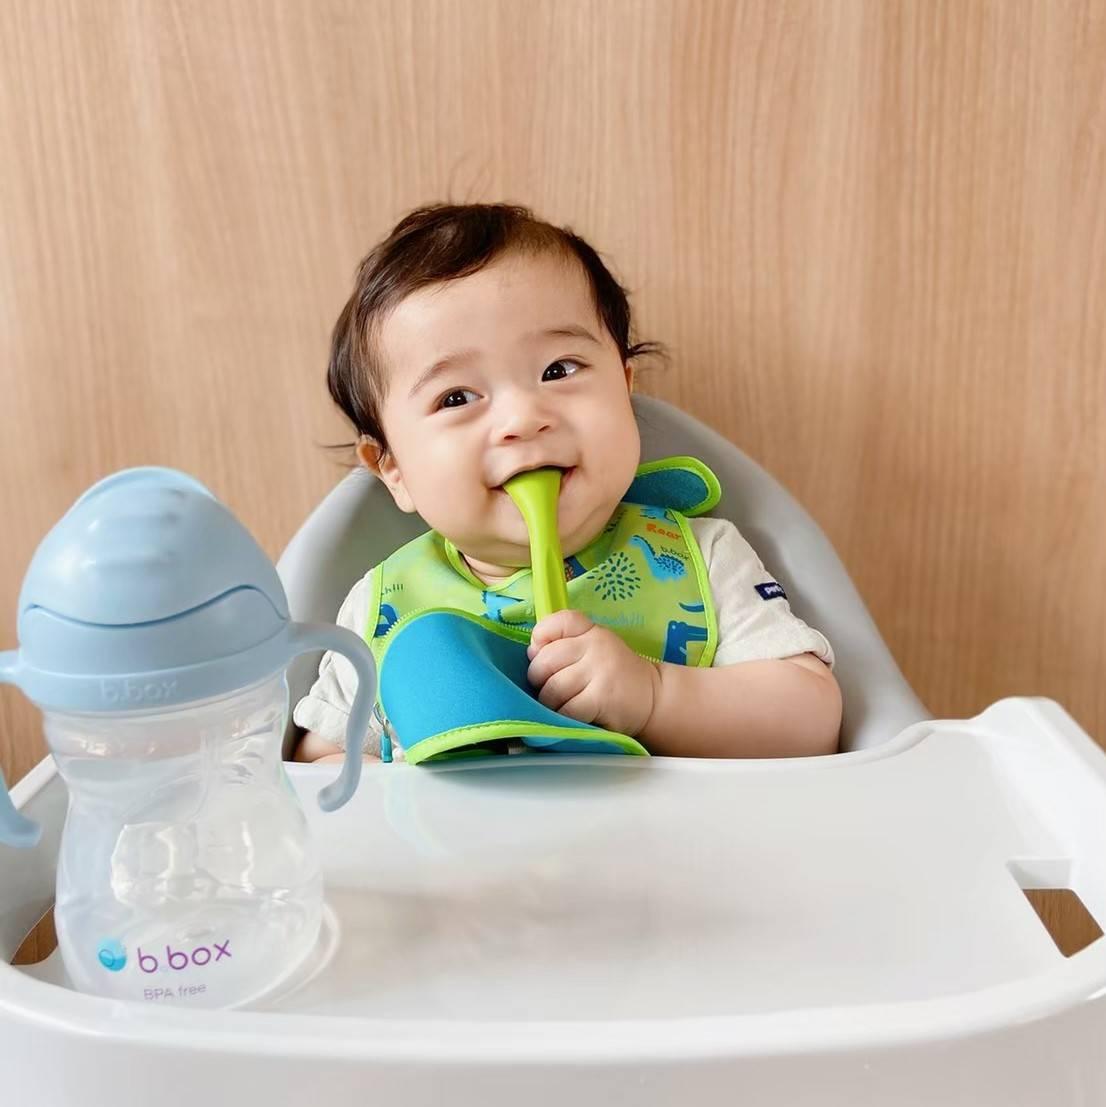 b.box 5ヶ月~1歳のお子さんにおすすめ